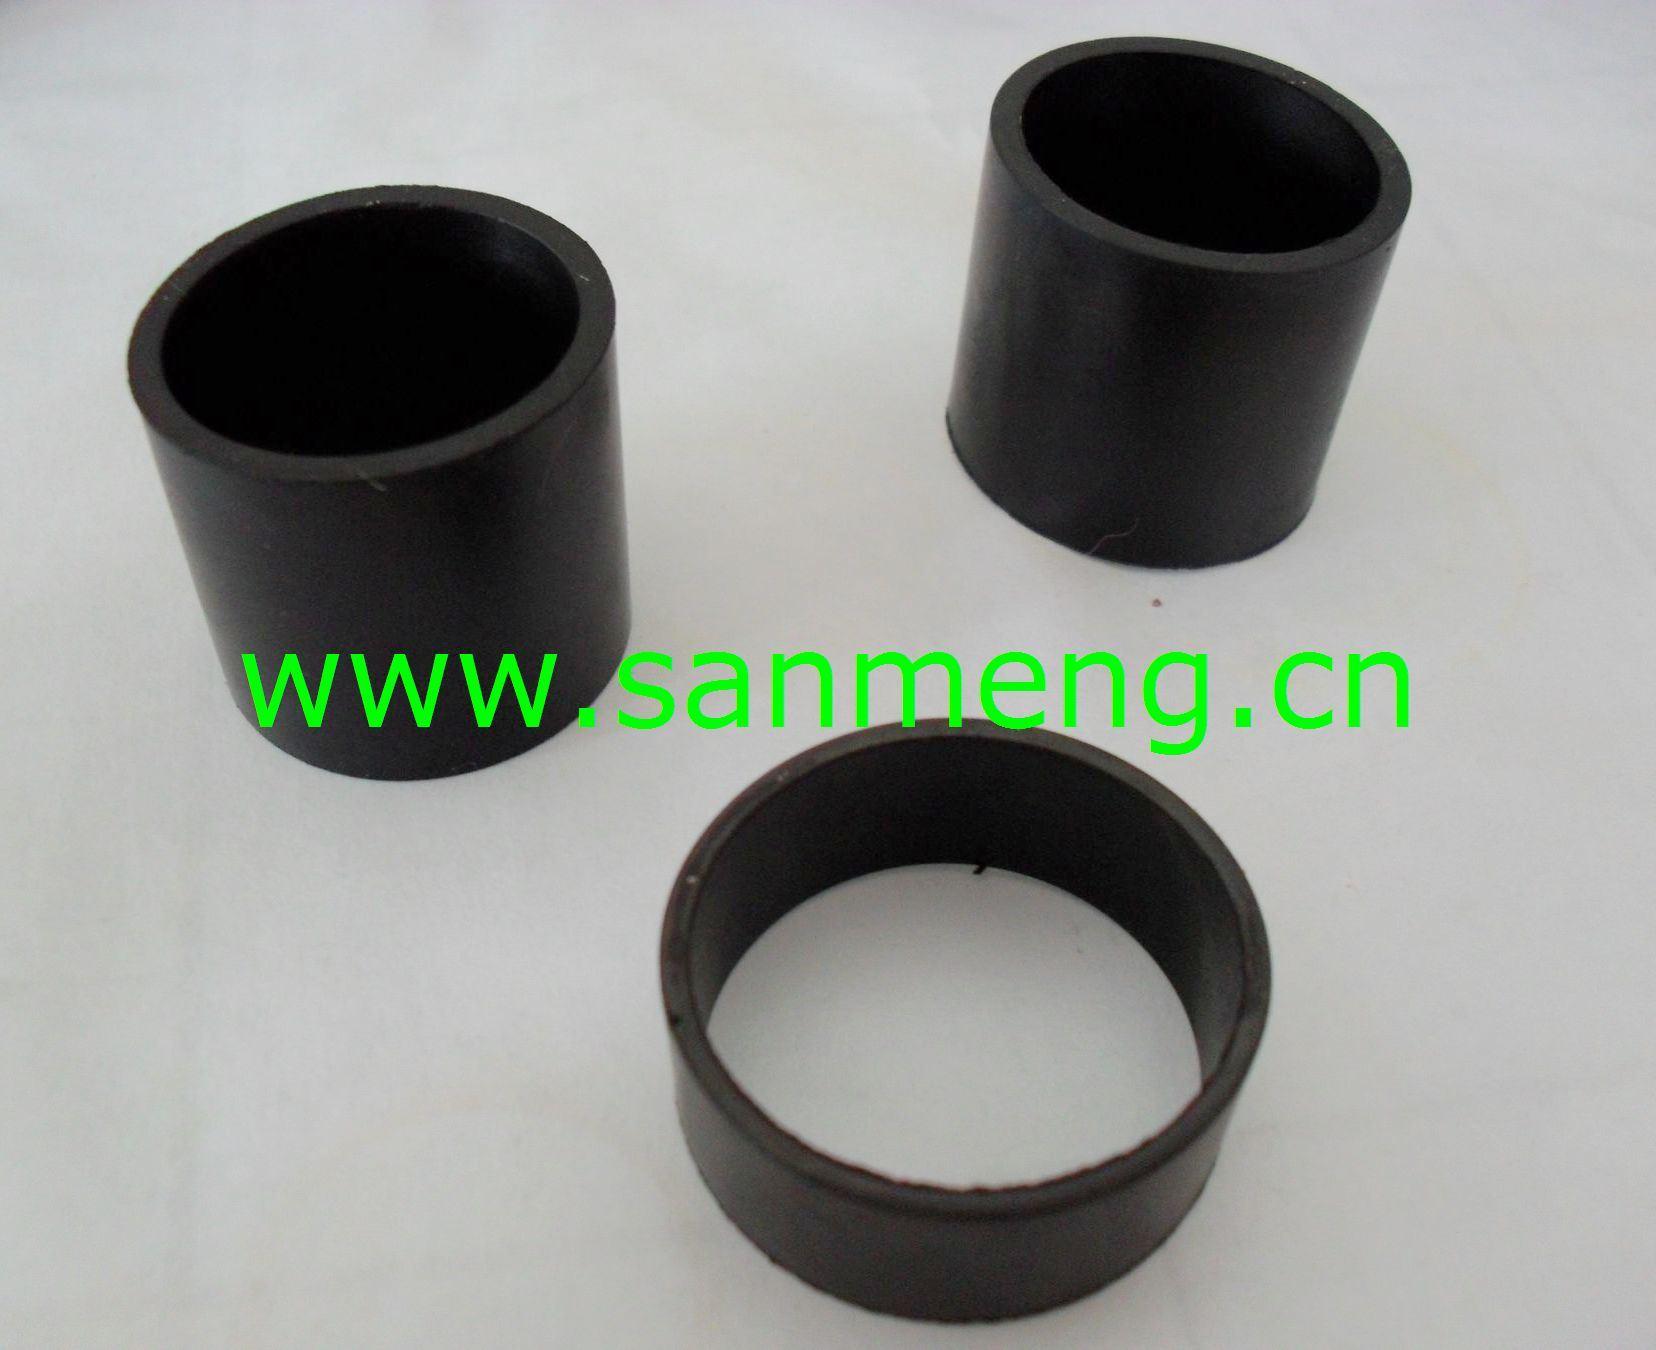 China customized pipe rubber sleeve sheath buthing